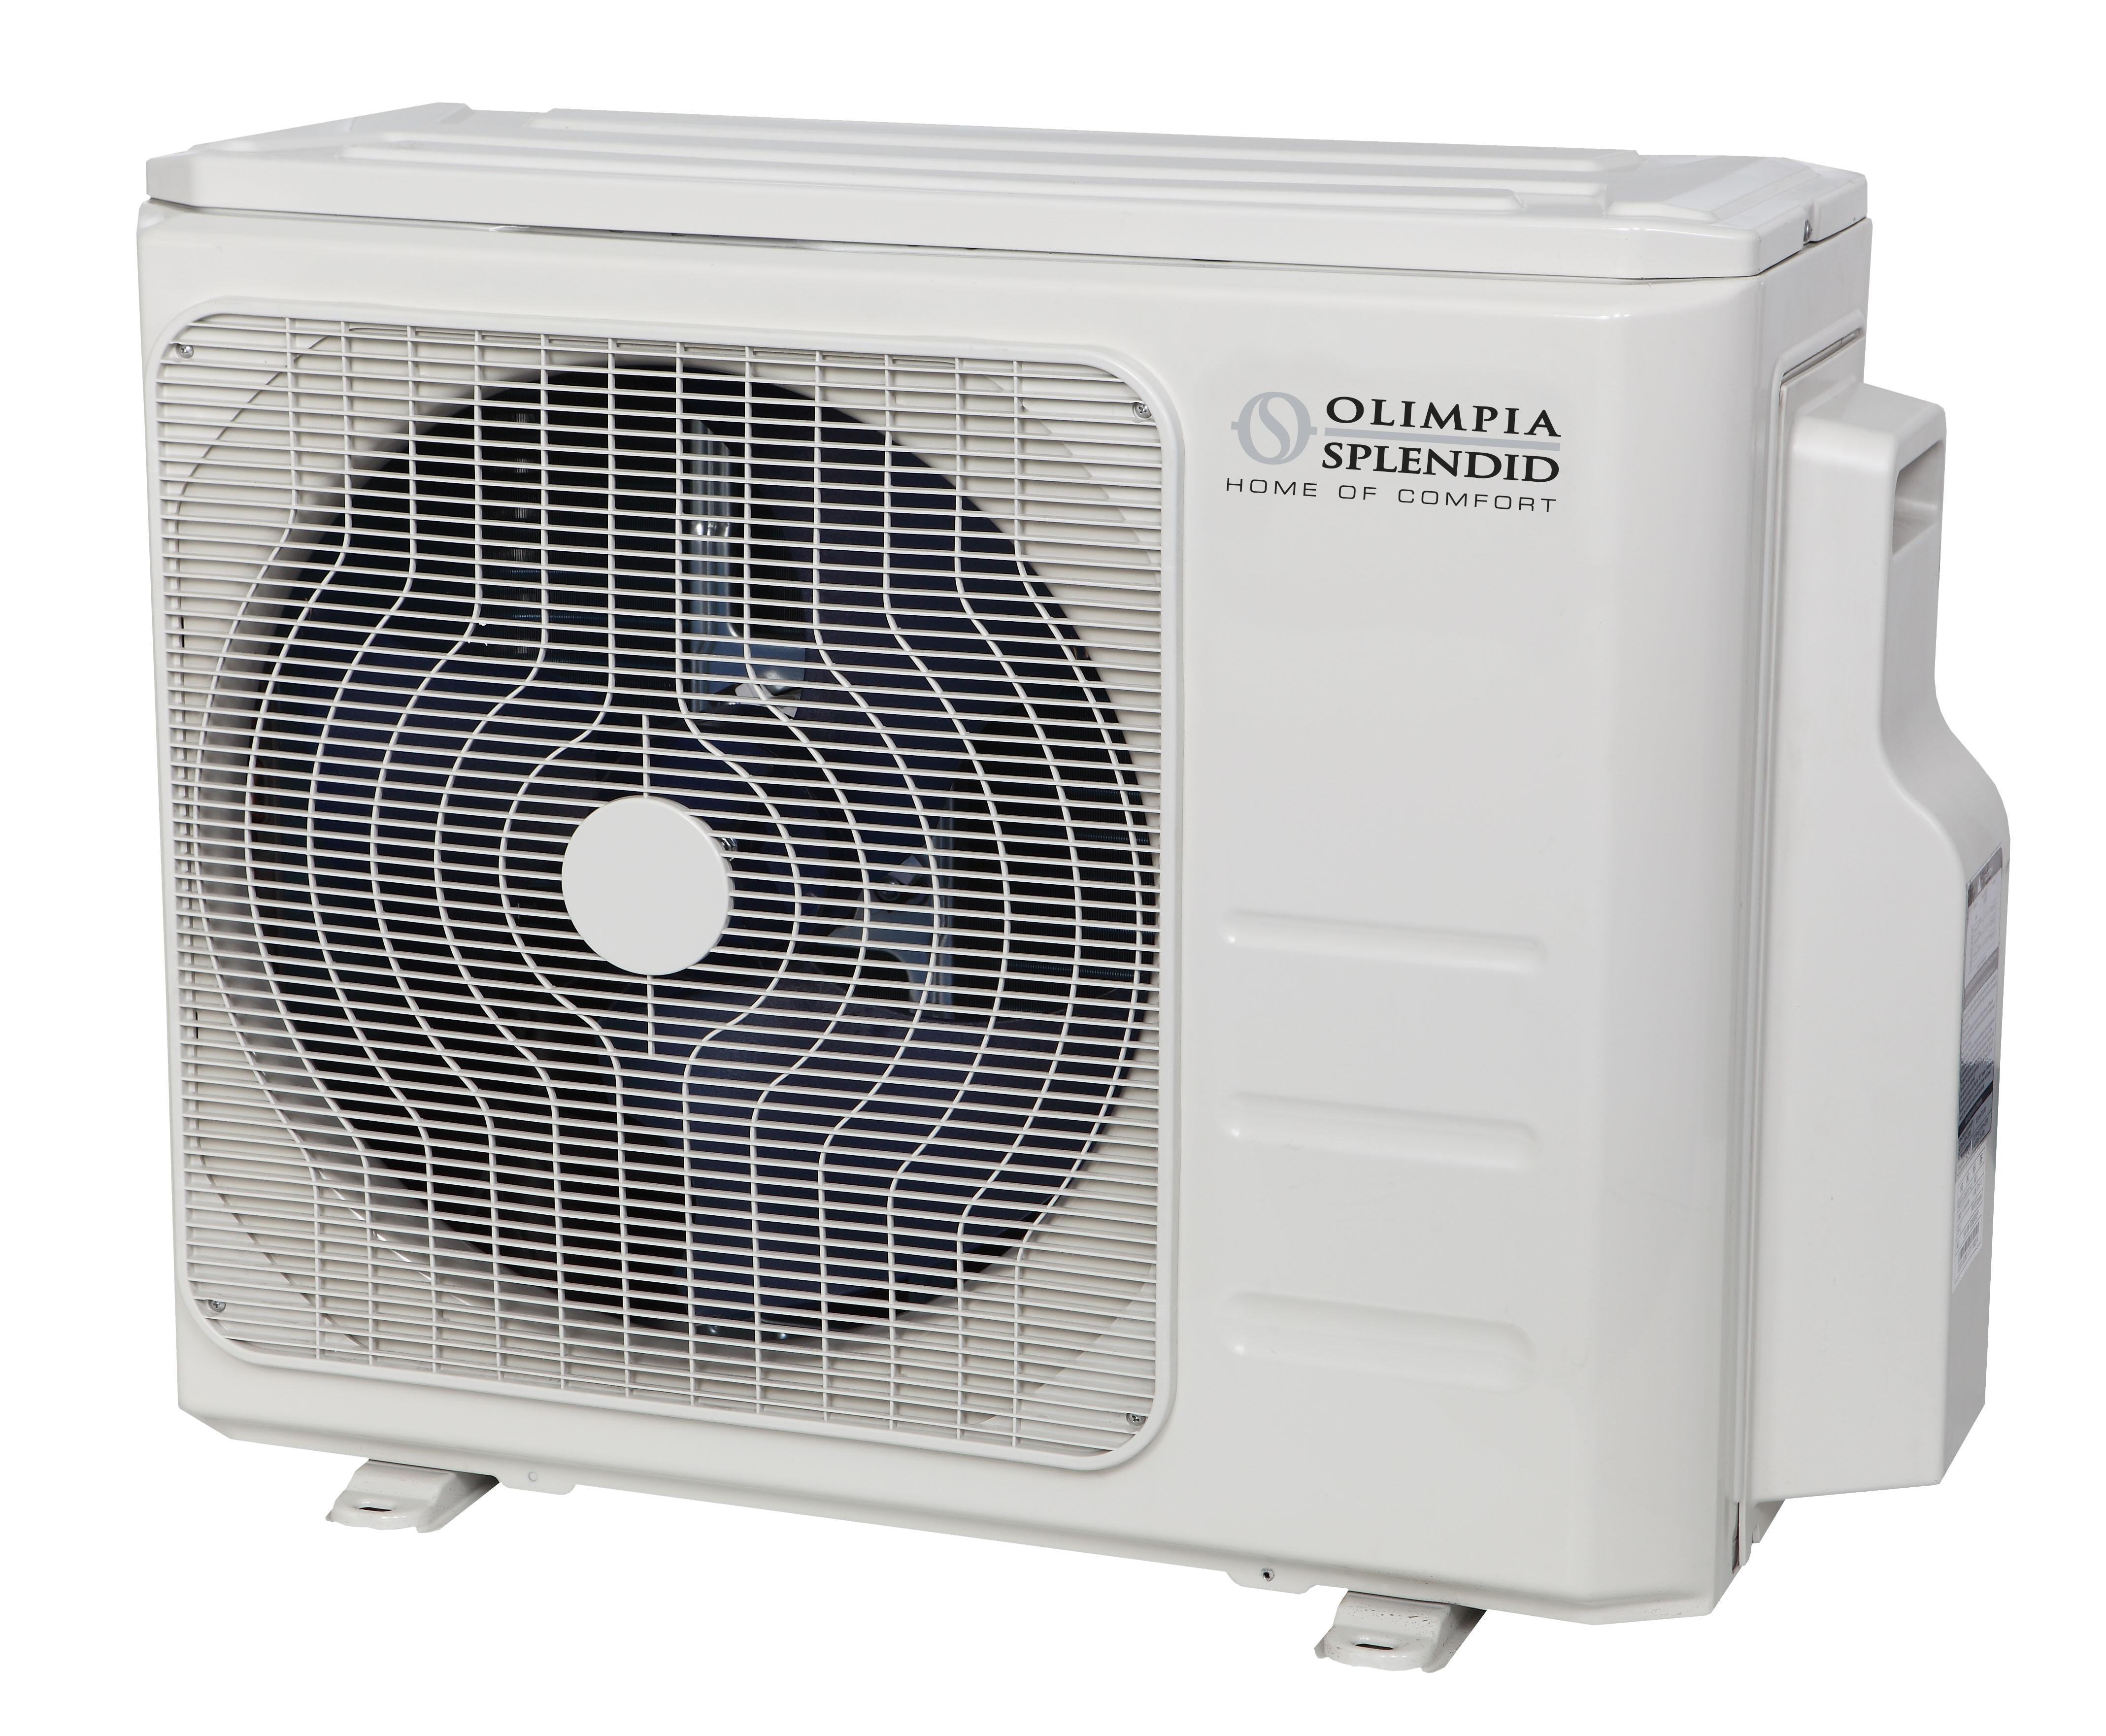 Klimatska naprava Olimpia Splendid NEXYA E Inverter 12 (3,5kW), z montažo